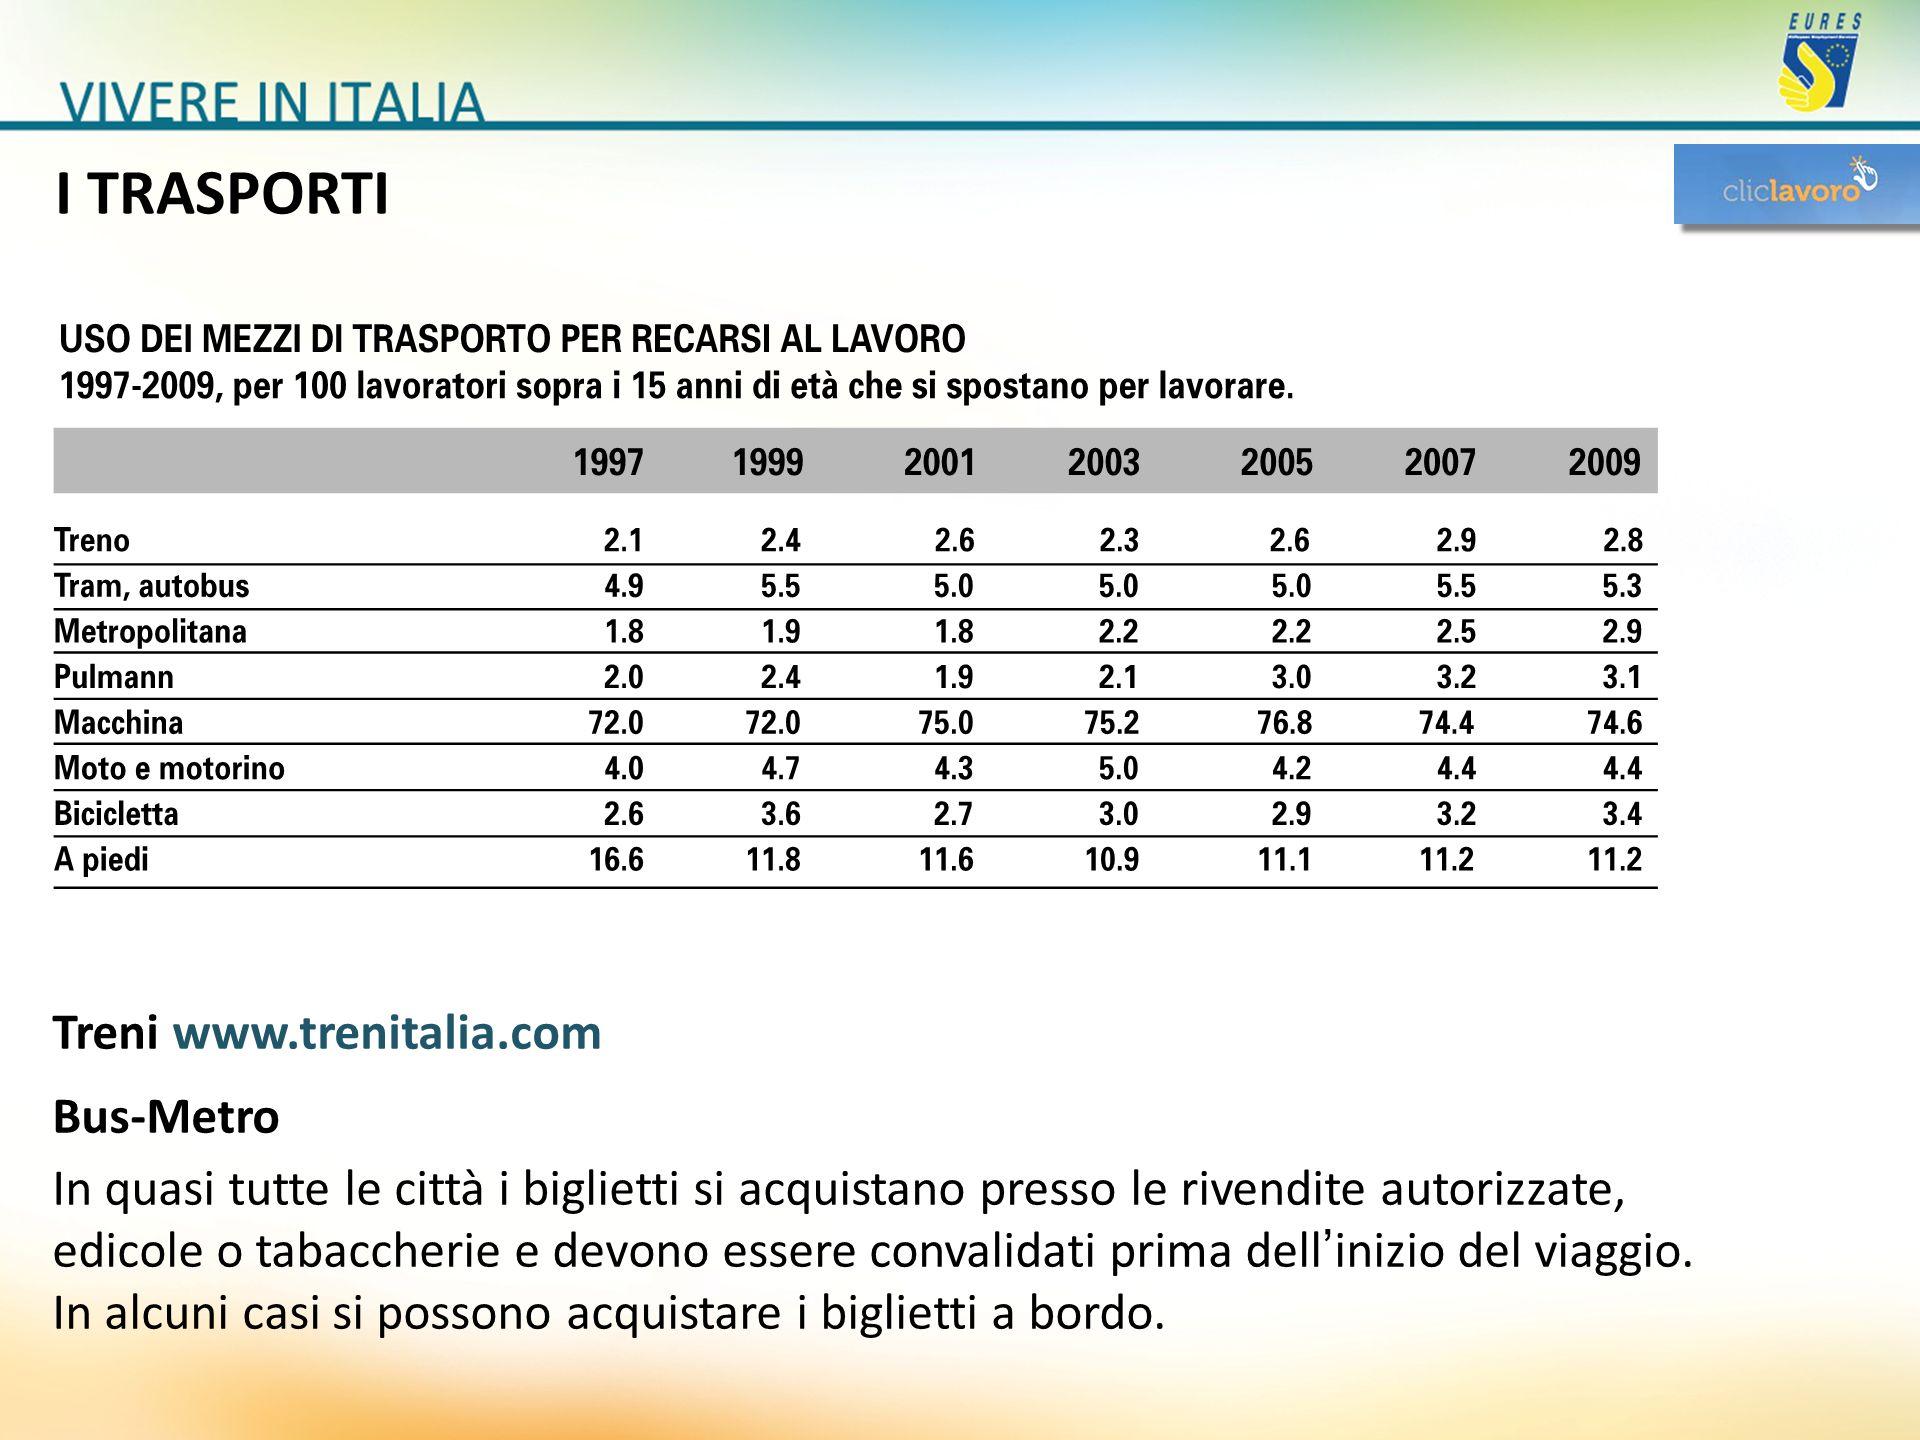 I TRASPORTI Treni www.trenitalia.com Bus-Metro